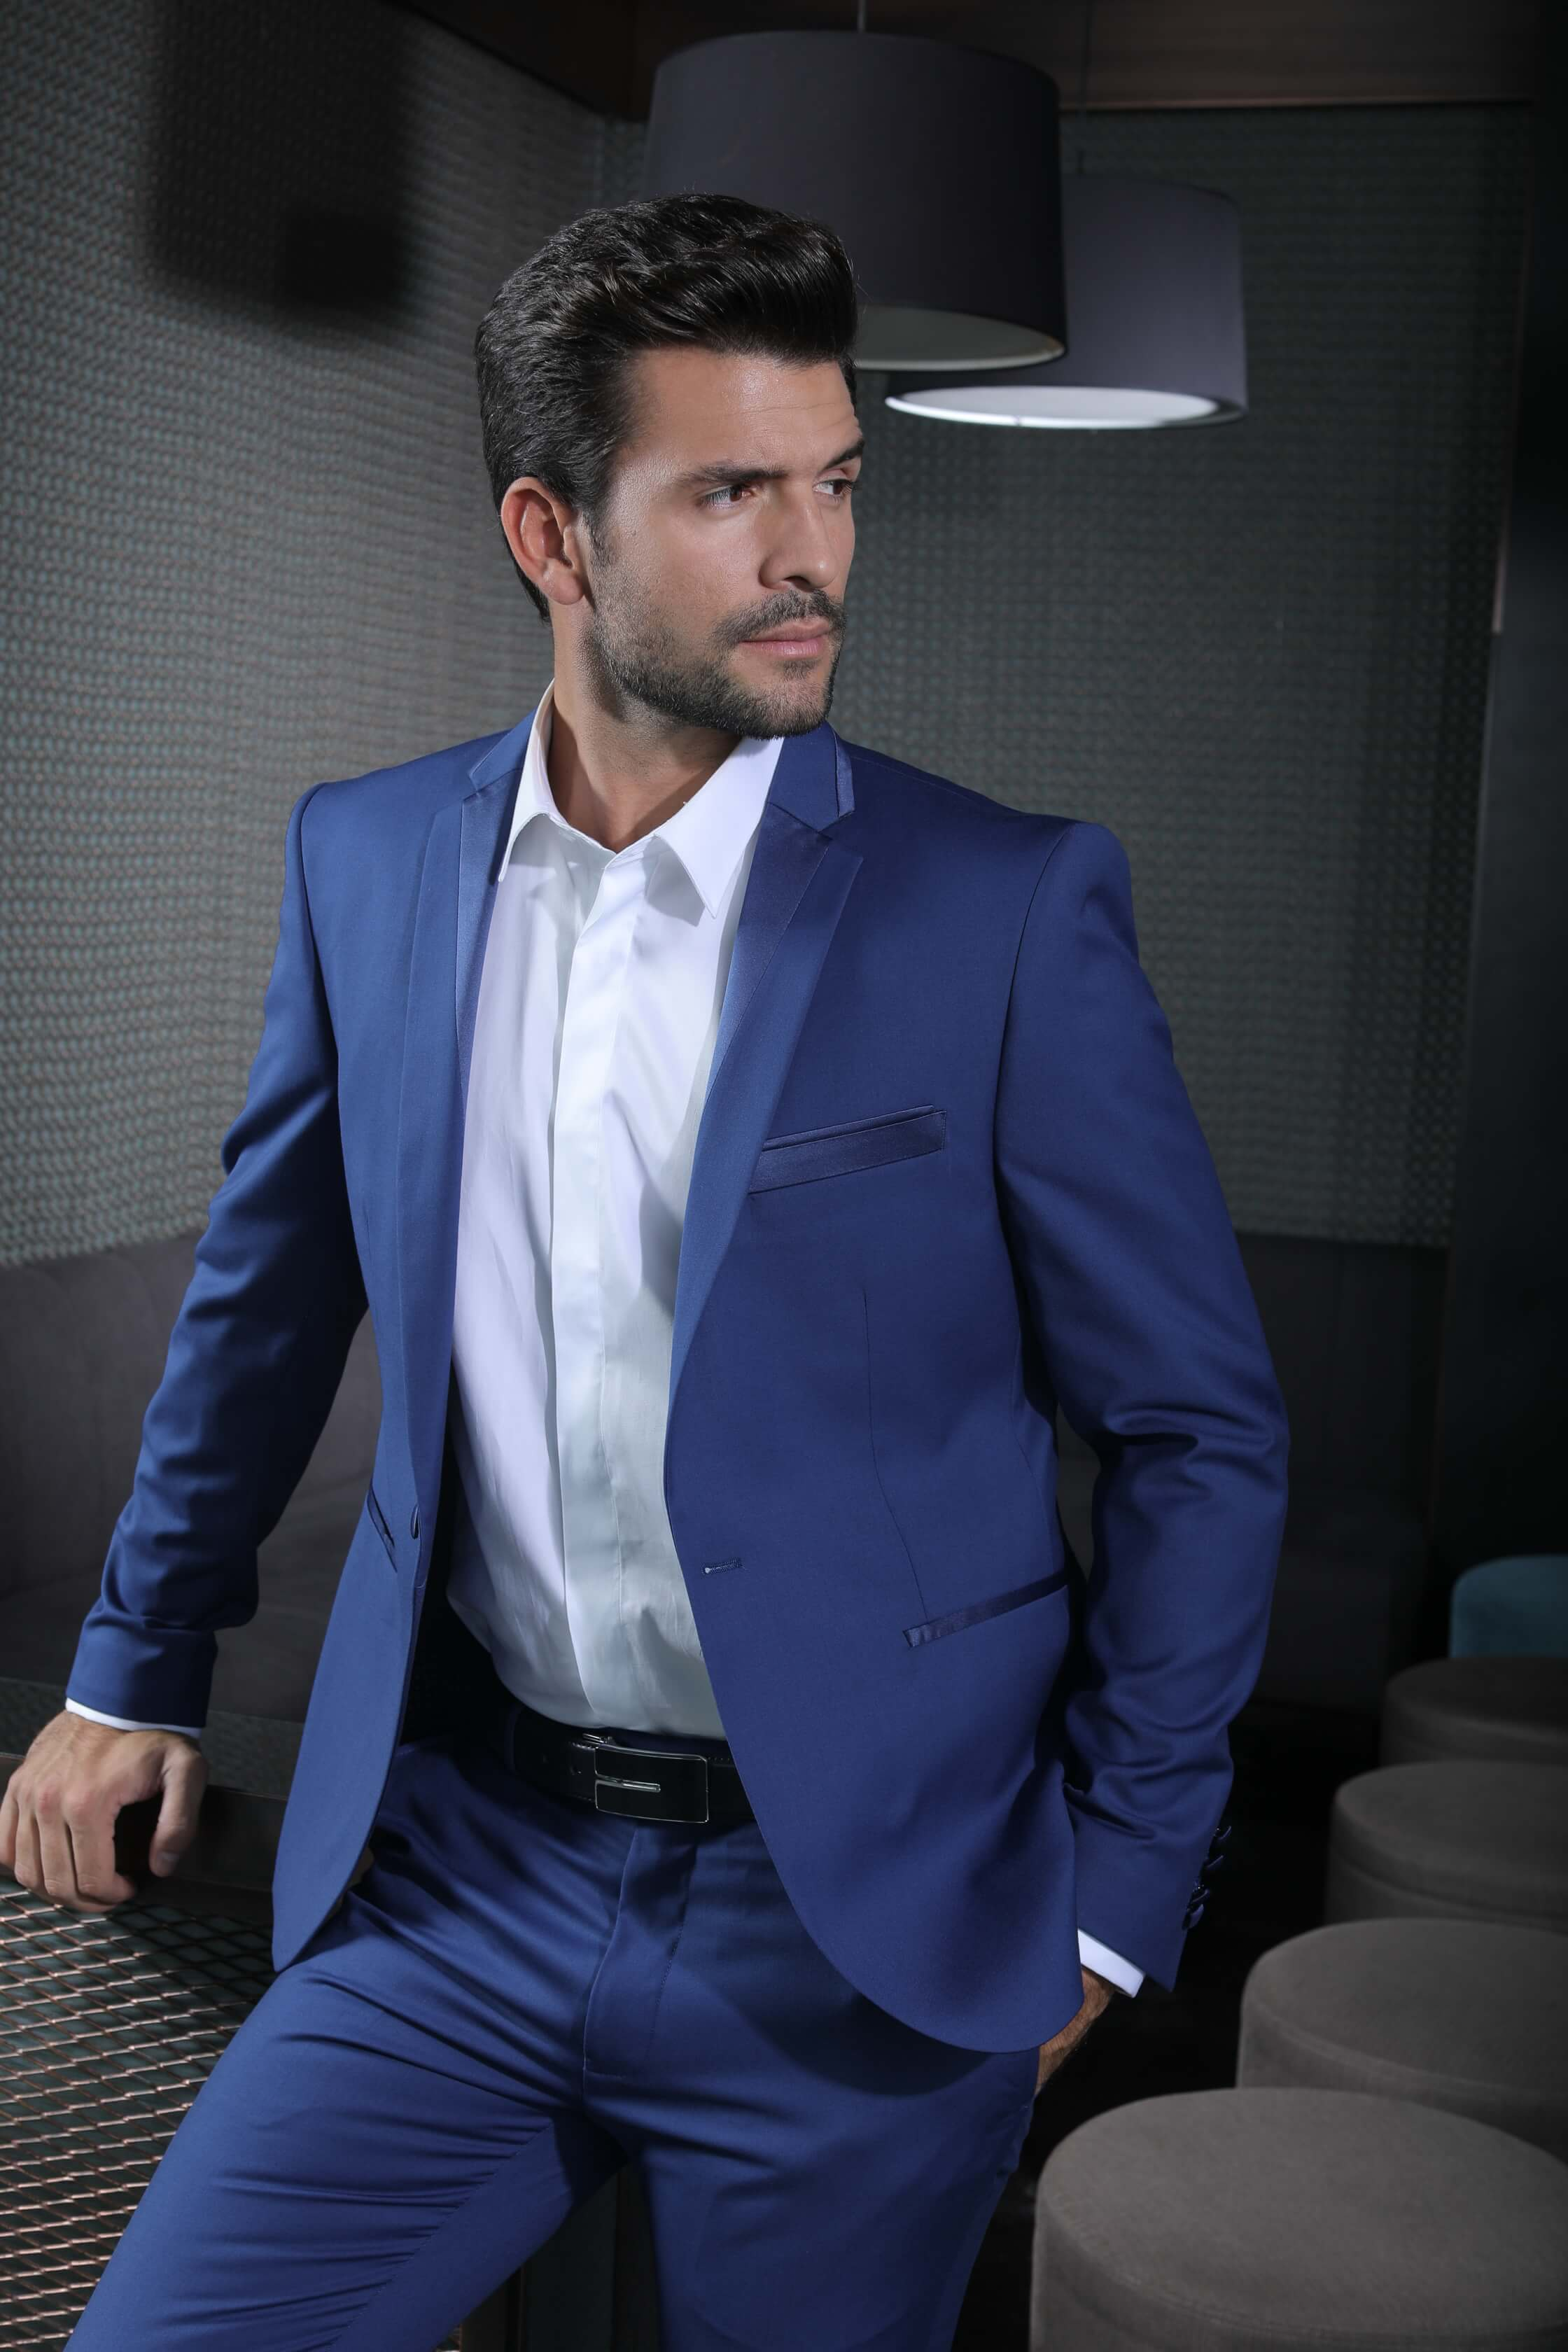 Costume homme mariage slim bleu - fermeleycaut.fr 70201cf1de0